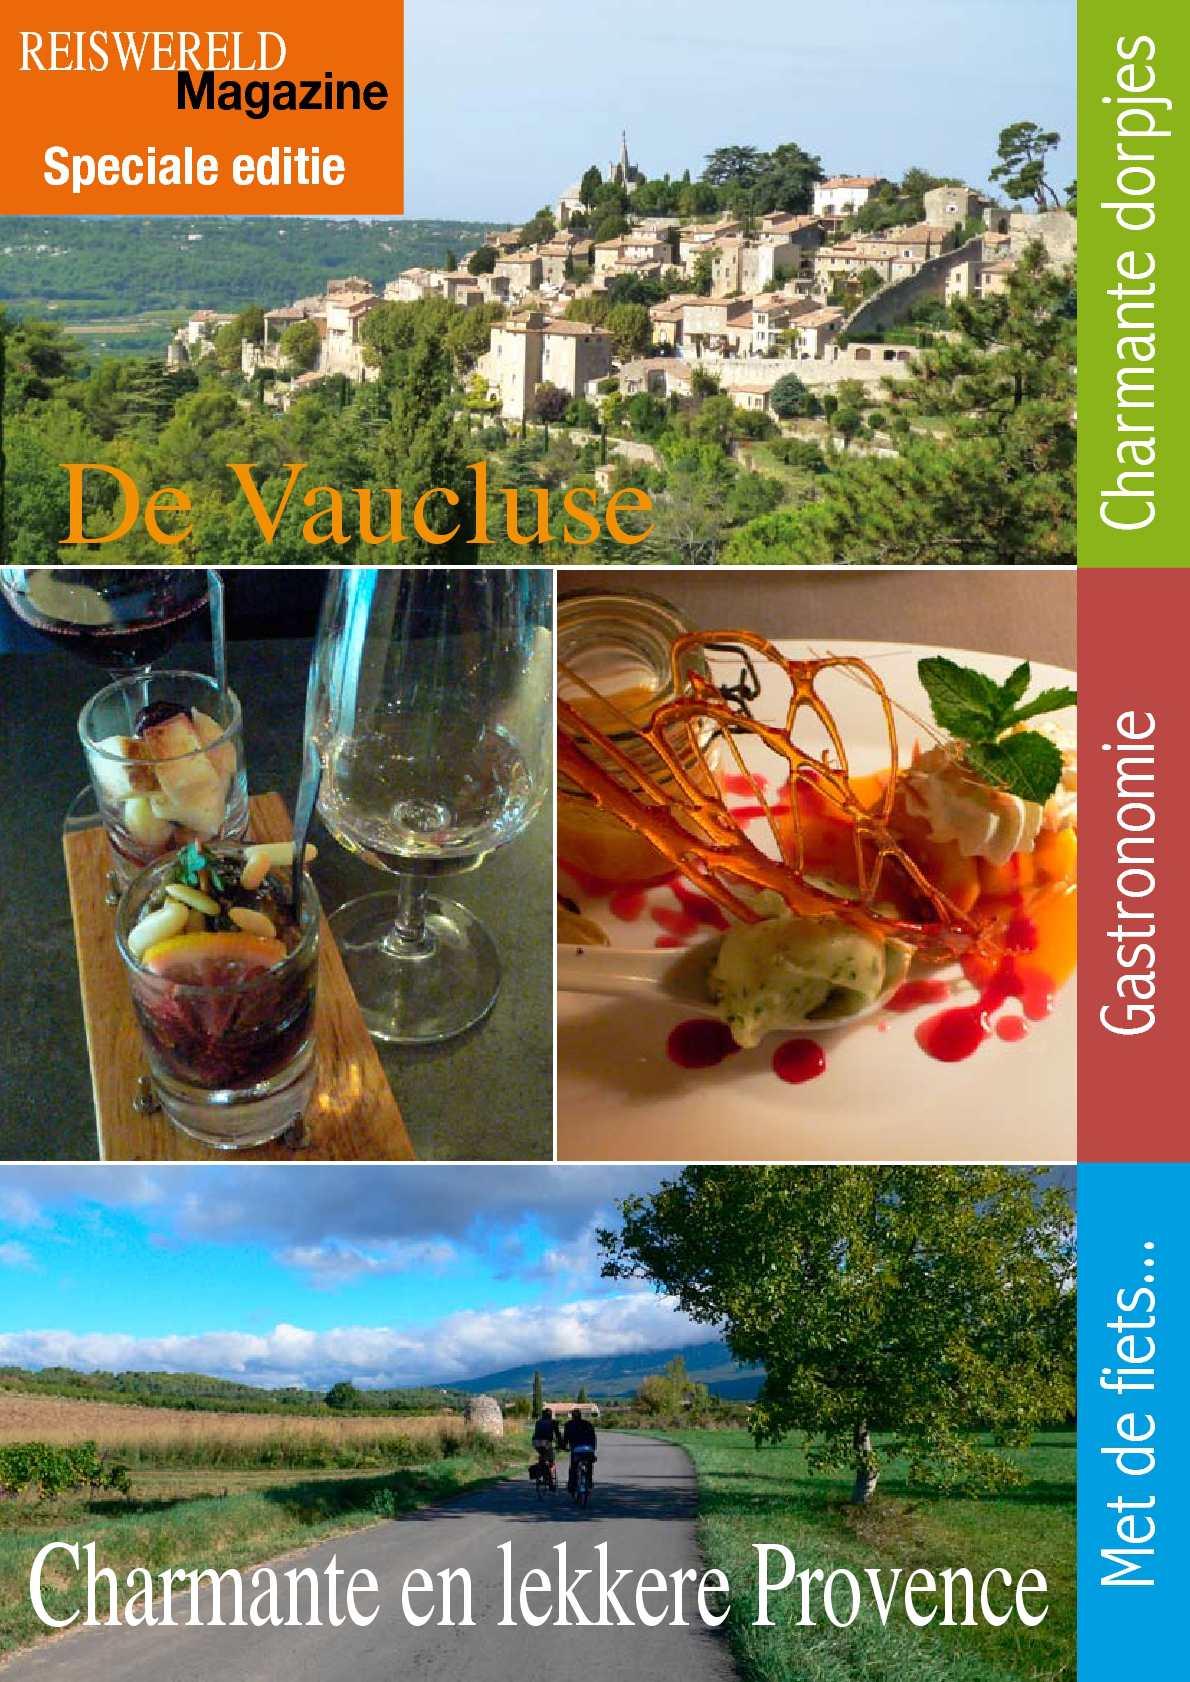 Reportage in de Vaucluse (Provence) van Reiswereld Magazine.be